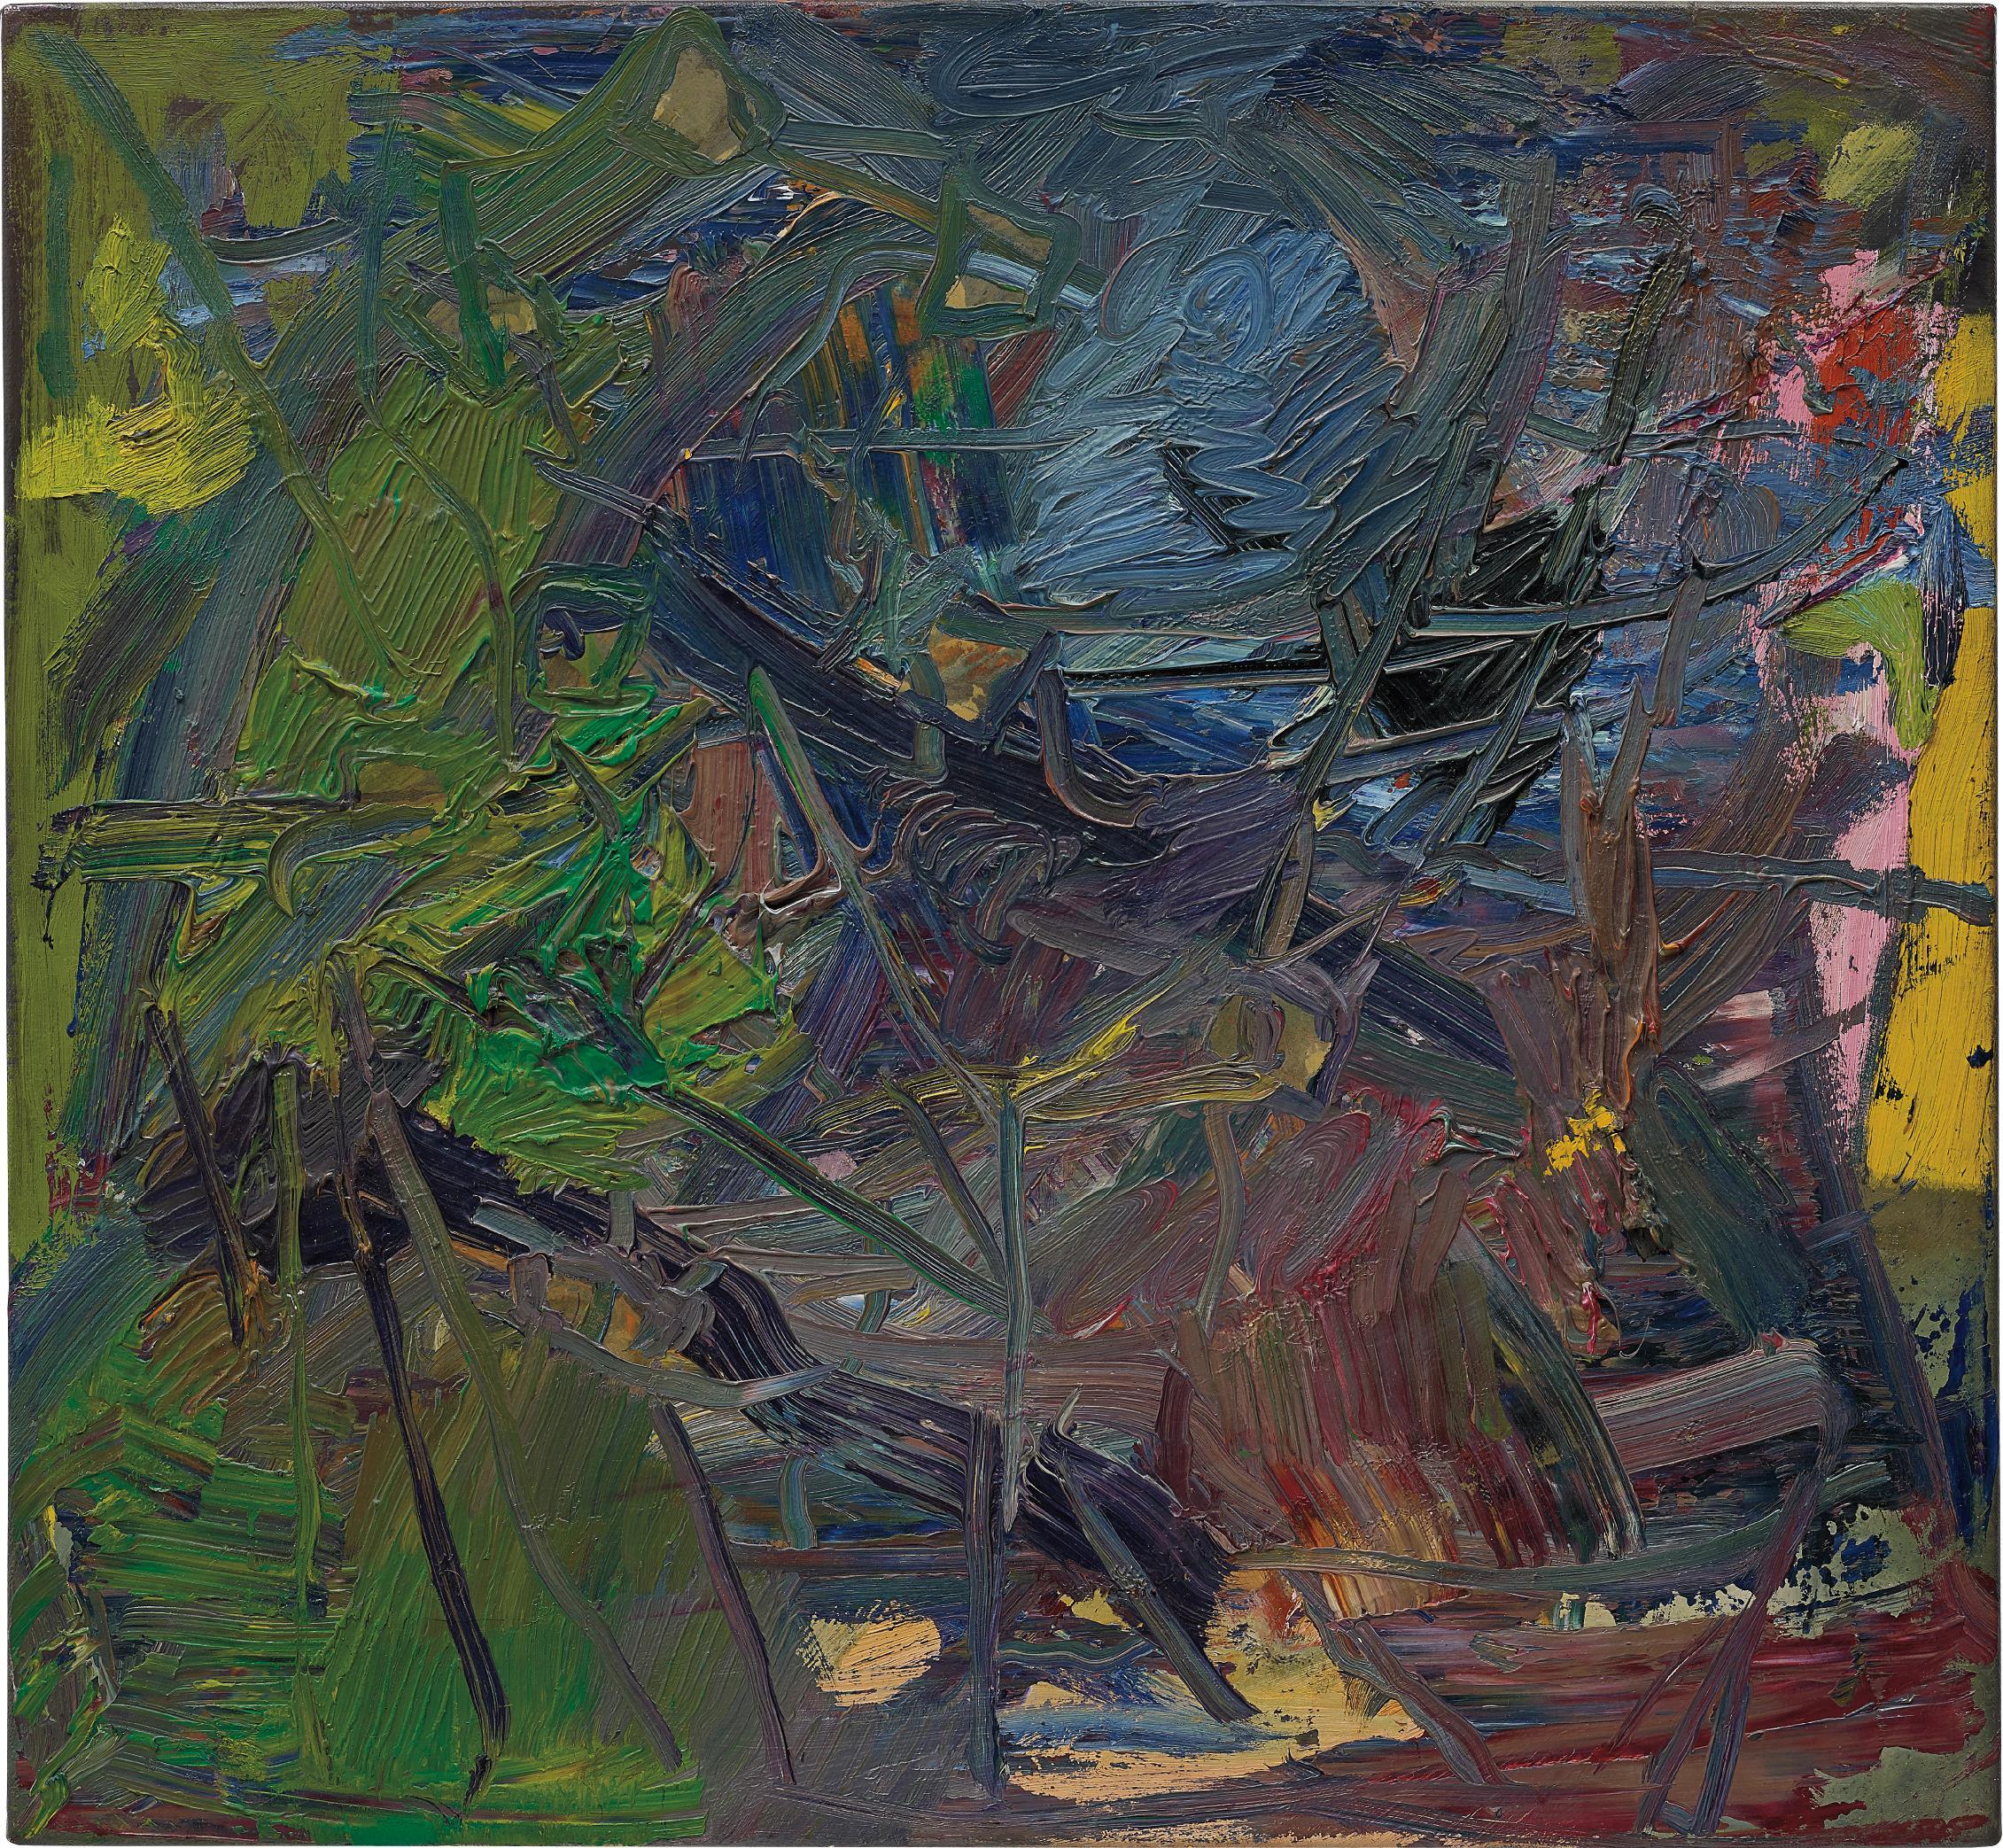 Gerhard Richter-Abstraktes Bild-1978